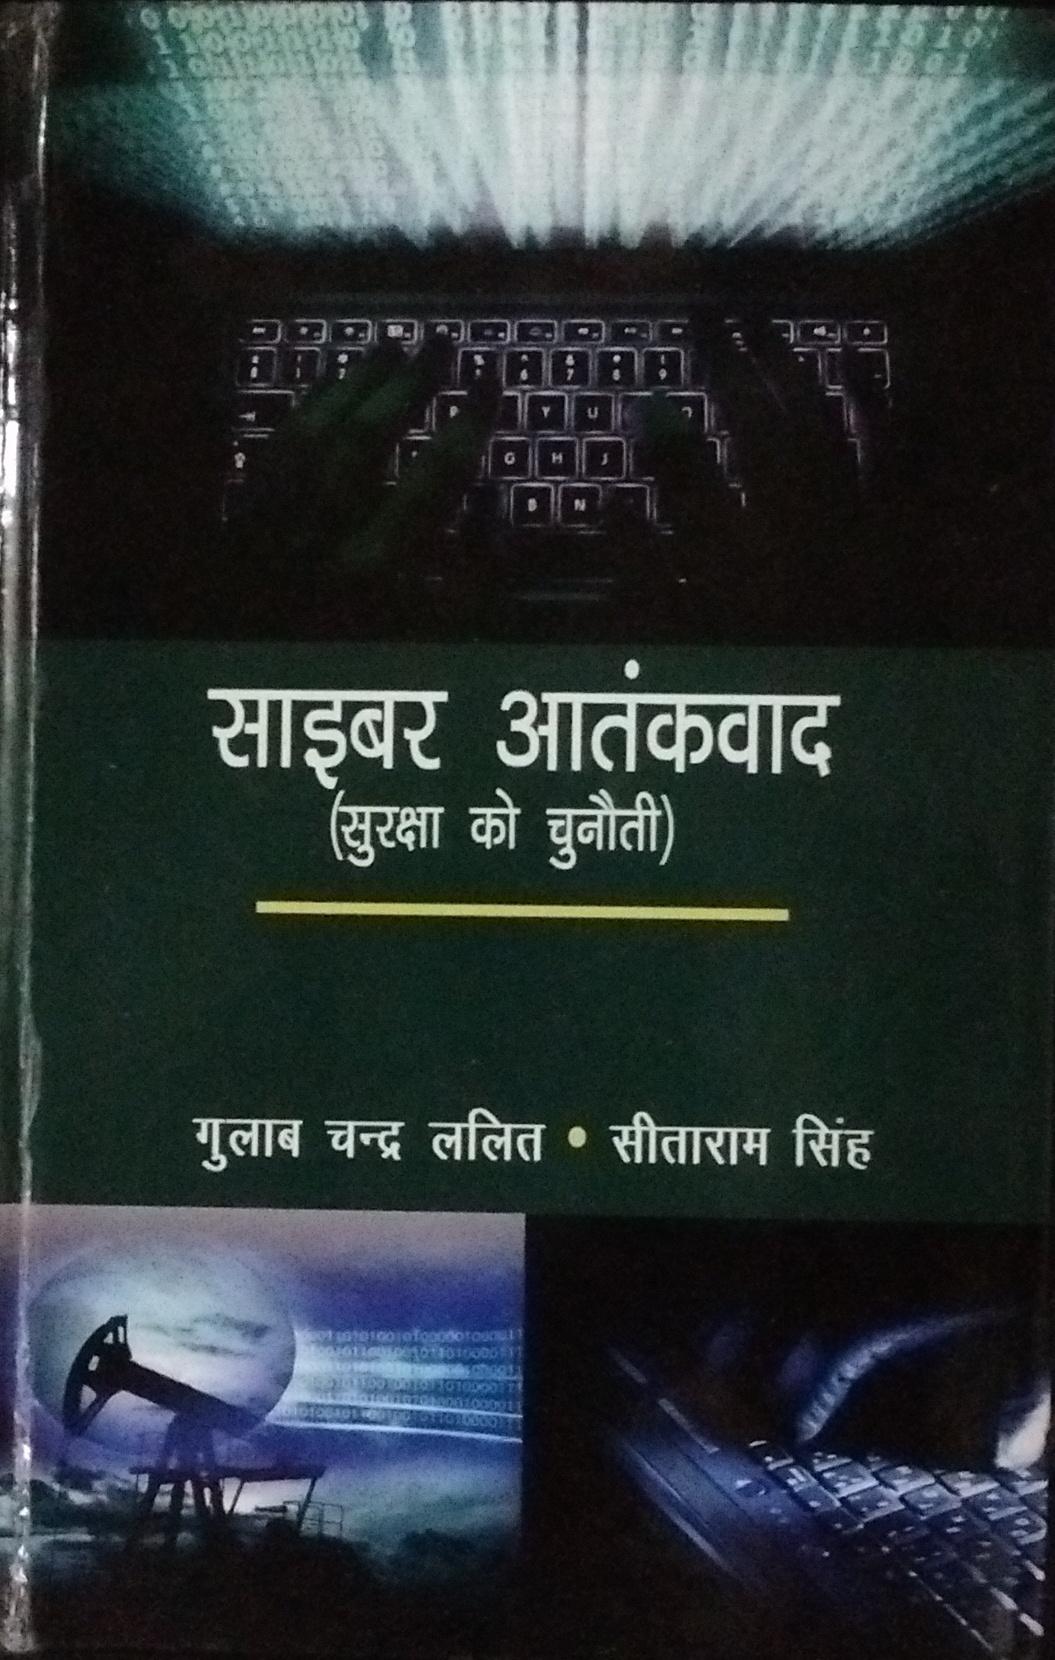 Cyber Aantakvad (Suraksha ko Chunoti) (Hindi)